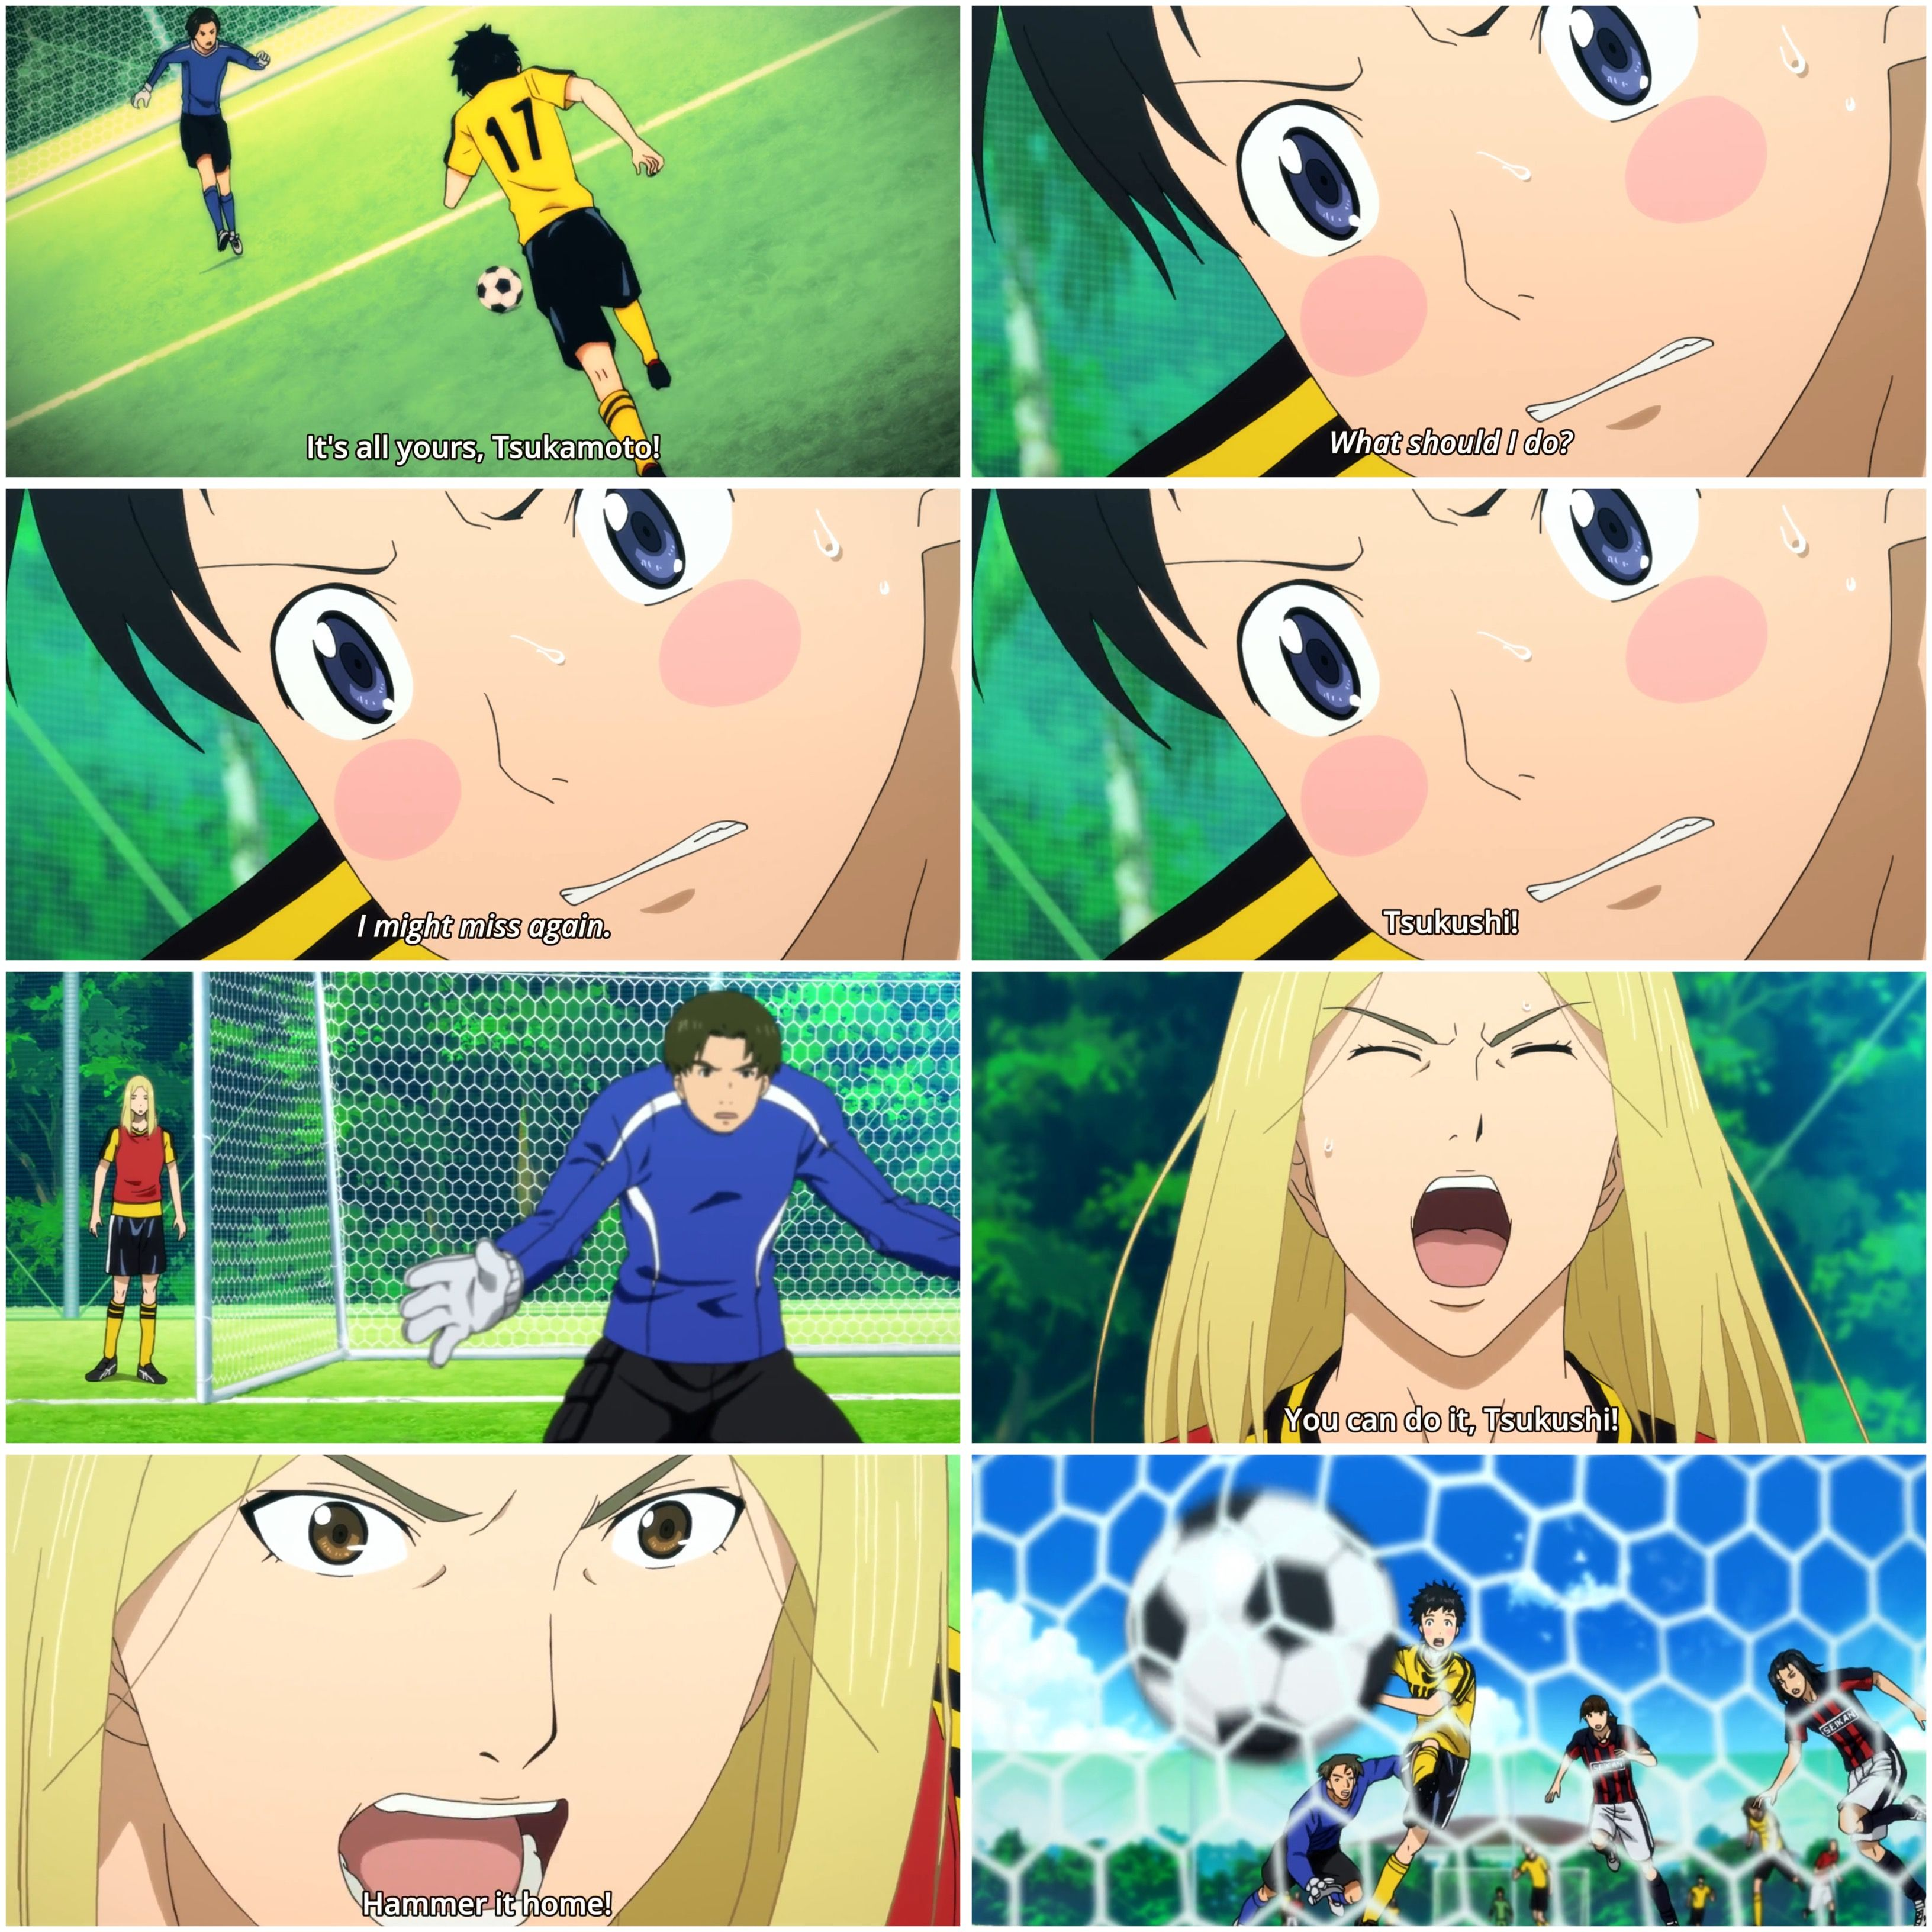 You Can Do It Tsukushi Hammer It Home Days Tv Soccer Anime Tsukamoto Tsukushi And Kazama Jin Sports Anime Anime Day